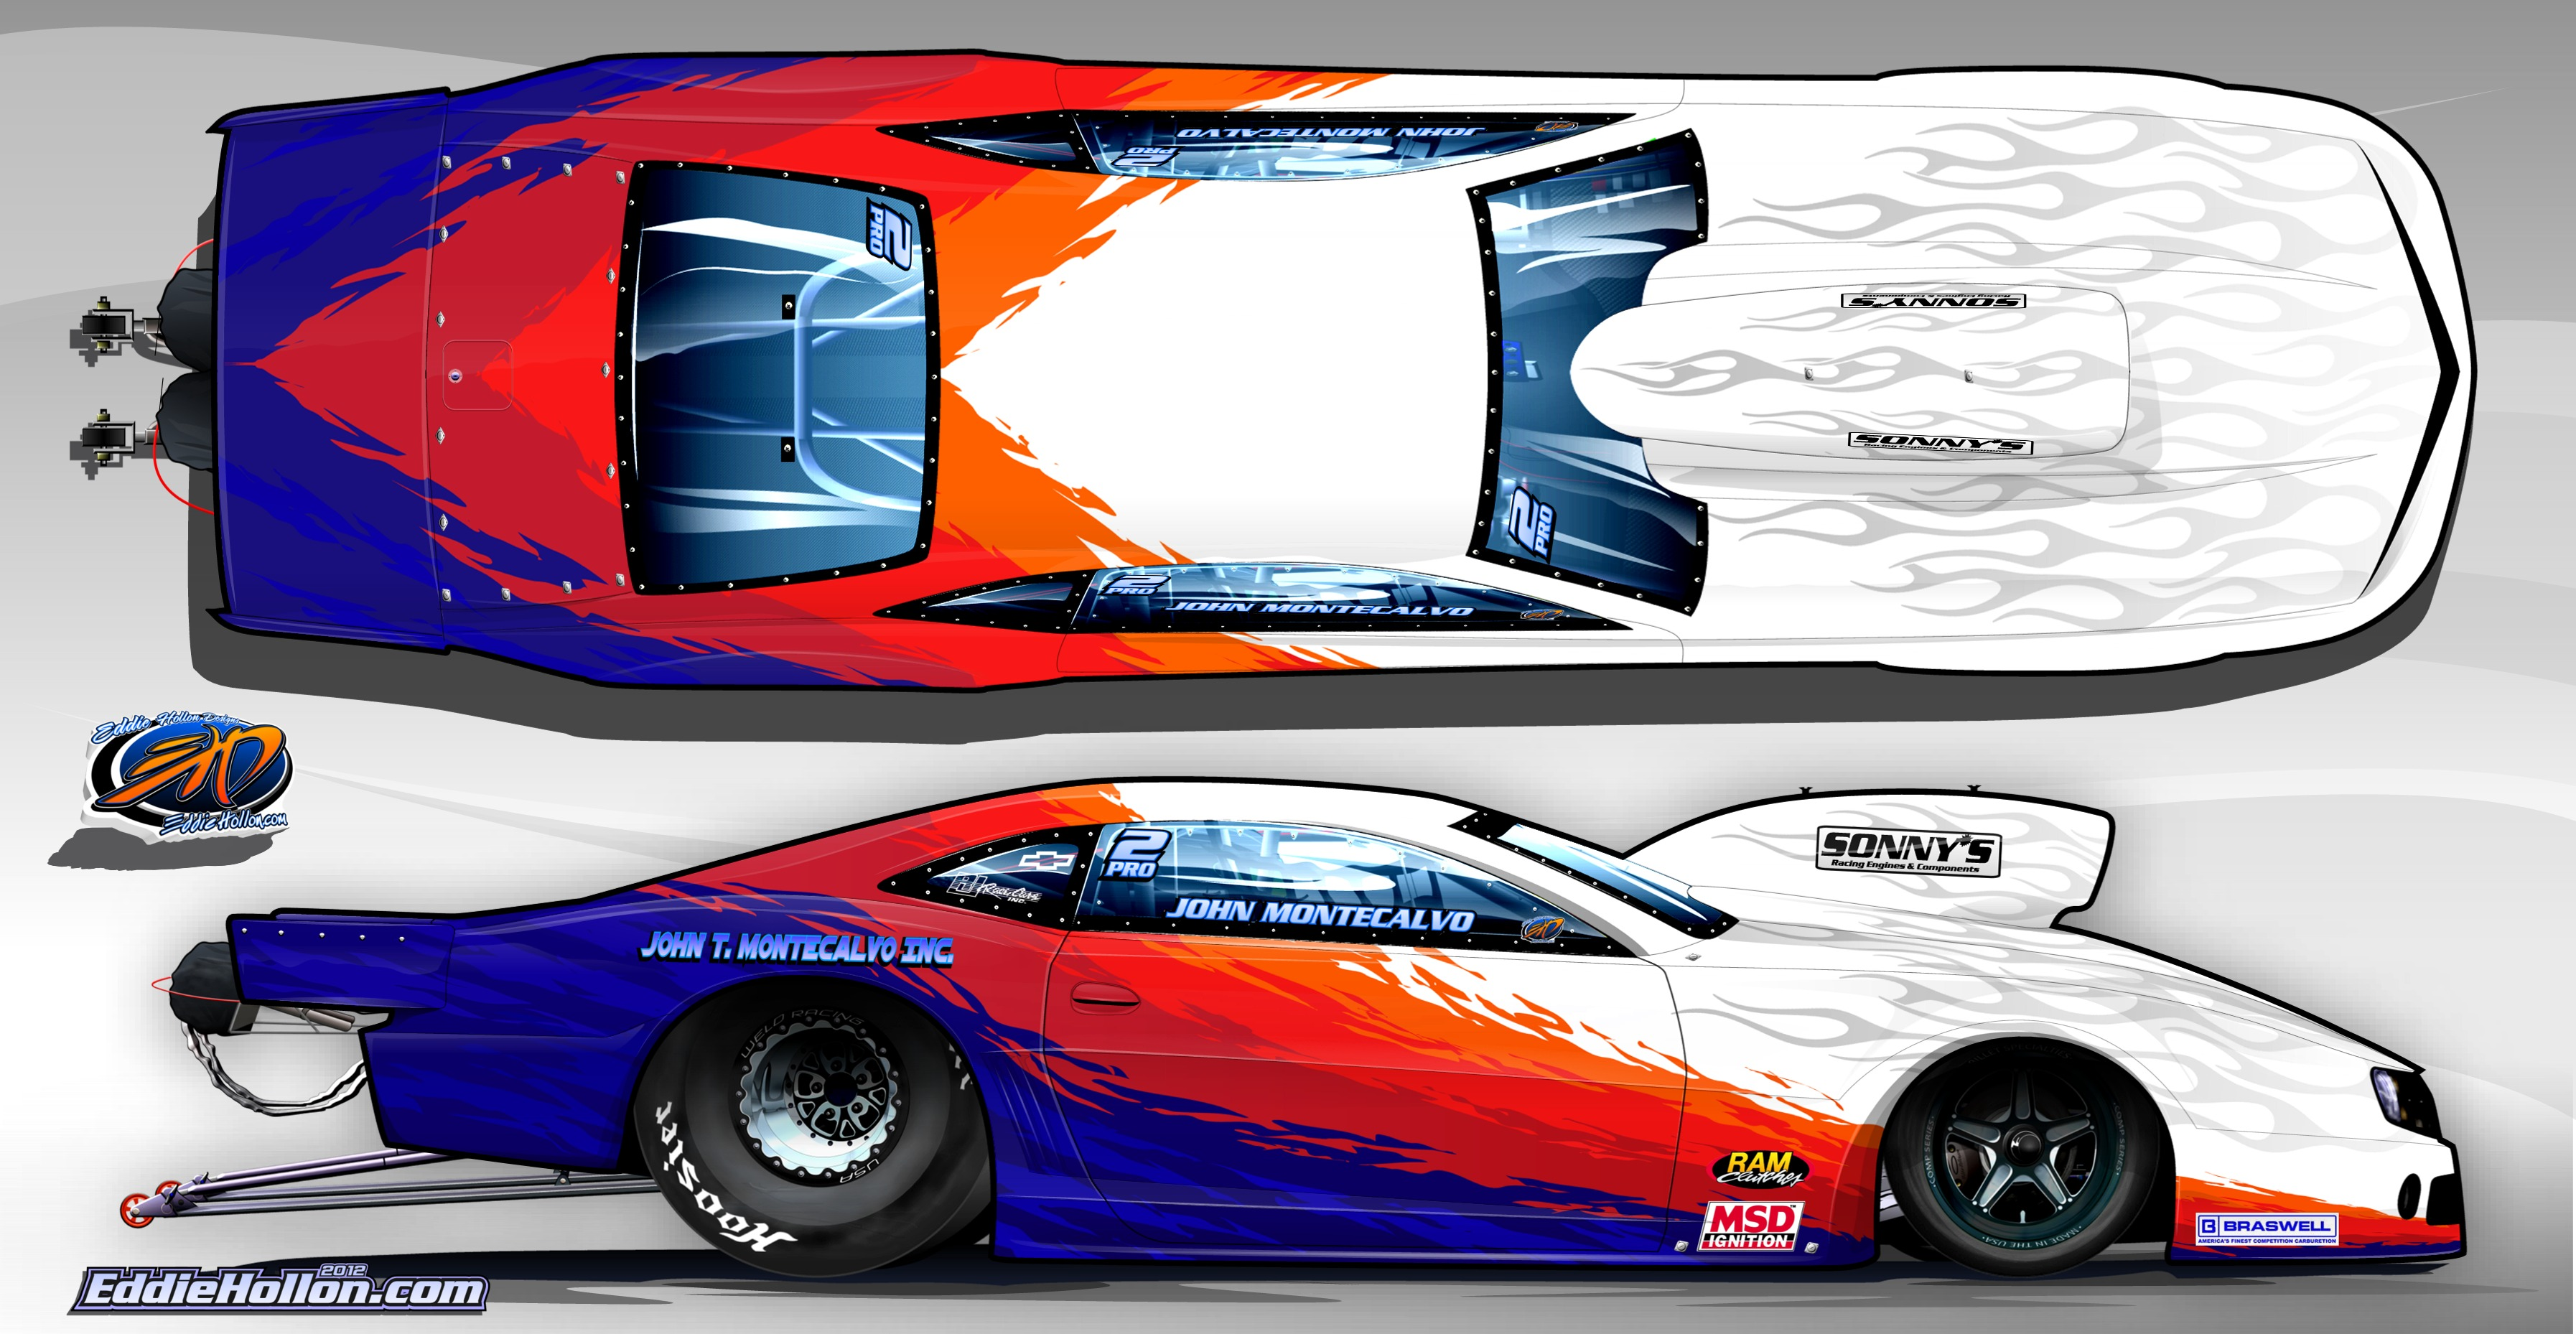 Drag race car paint schemes - Montecalvo Unveils New 2012 Camaro Paint Scheme